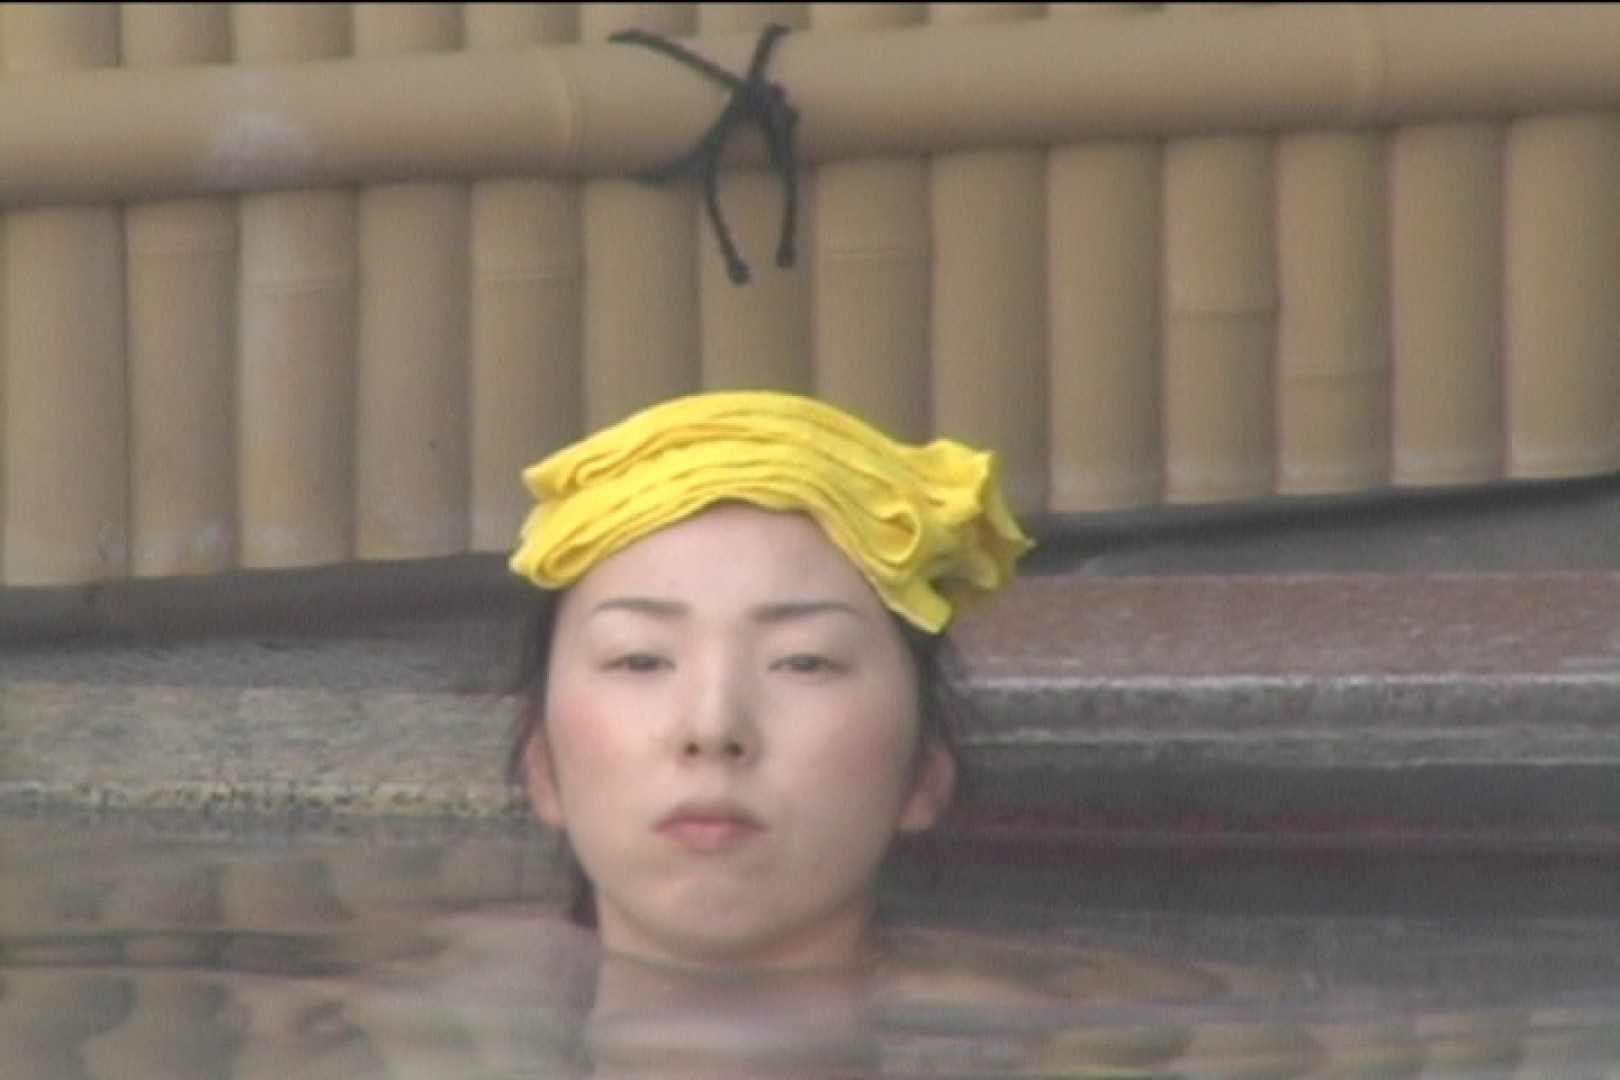 Aquaな露天風呂Vol.529 盗撮映像  51Pix 5